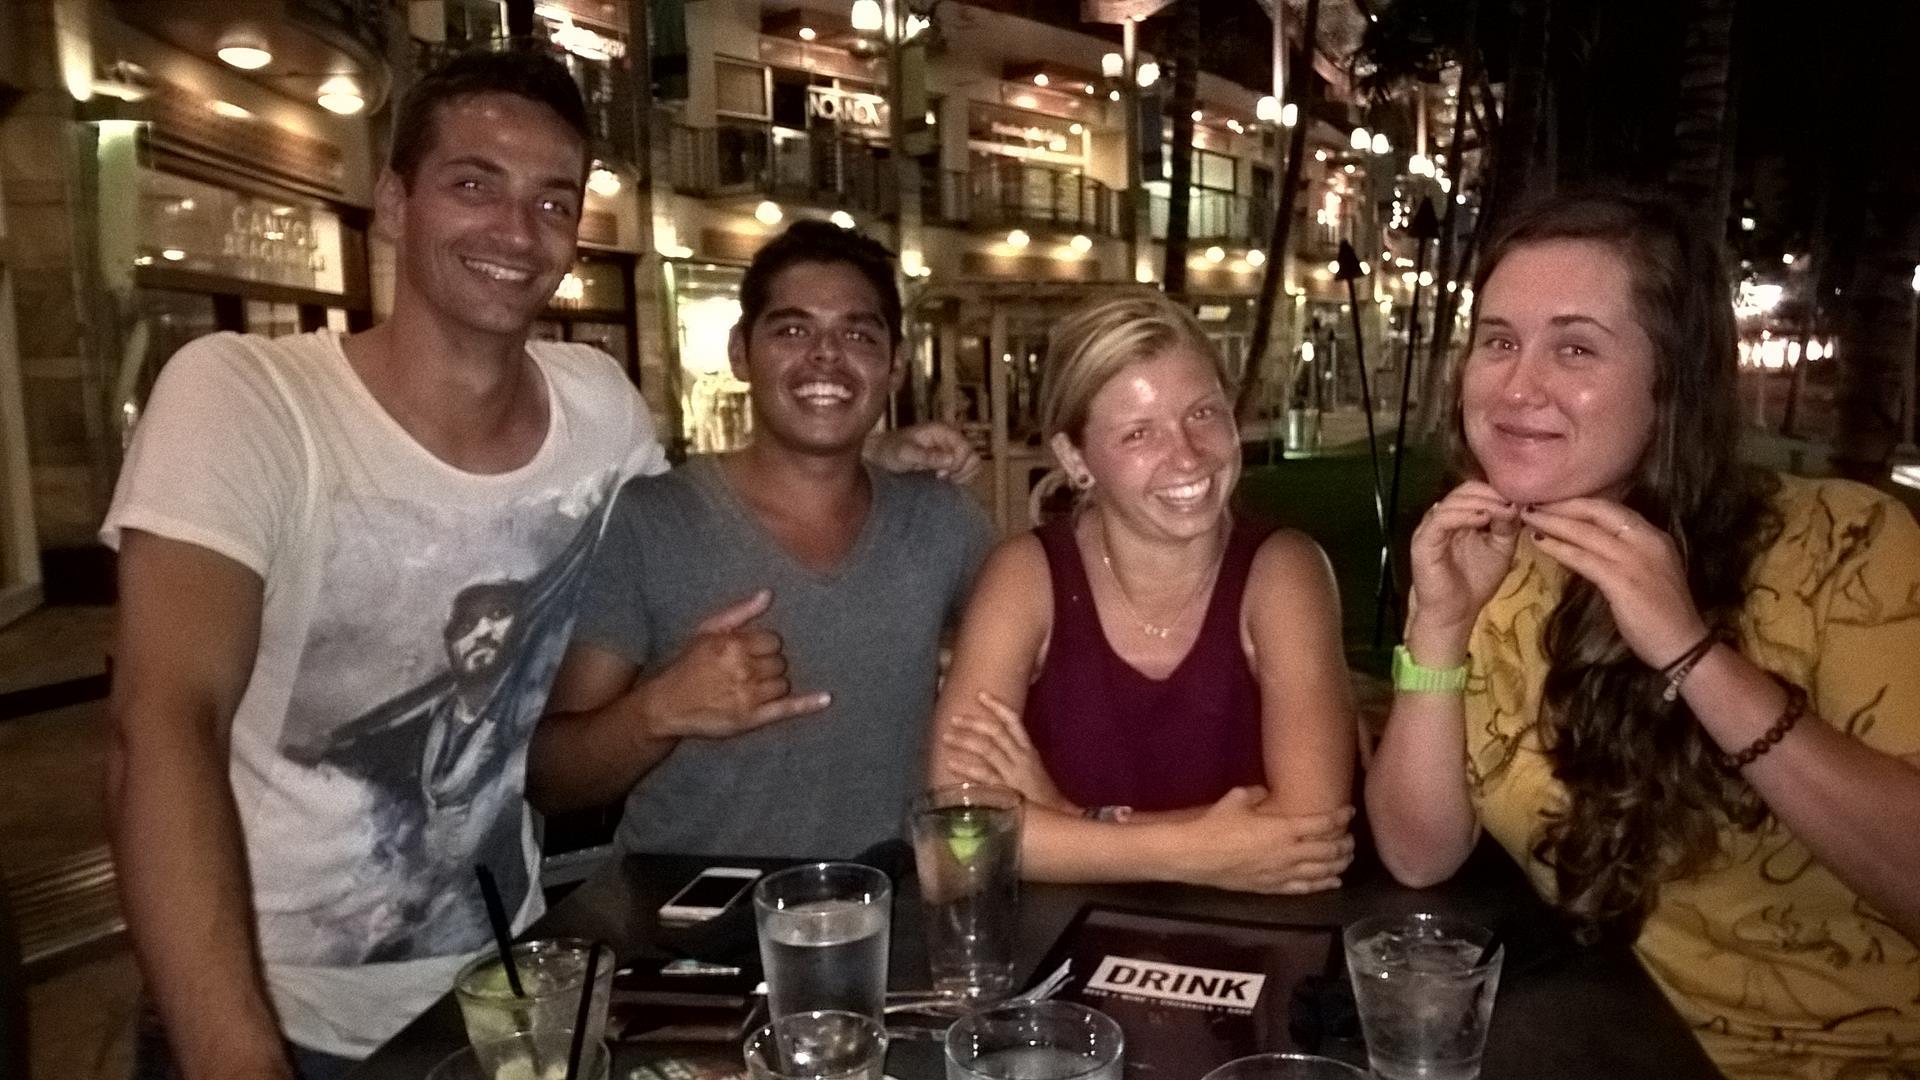 Bethany, Christina, Jordan und ich in der Yard Bar